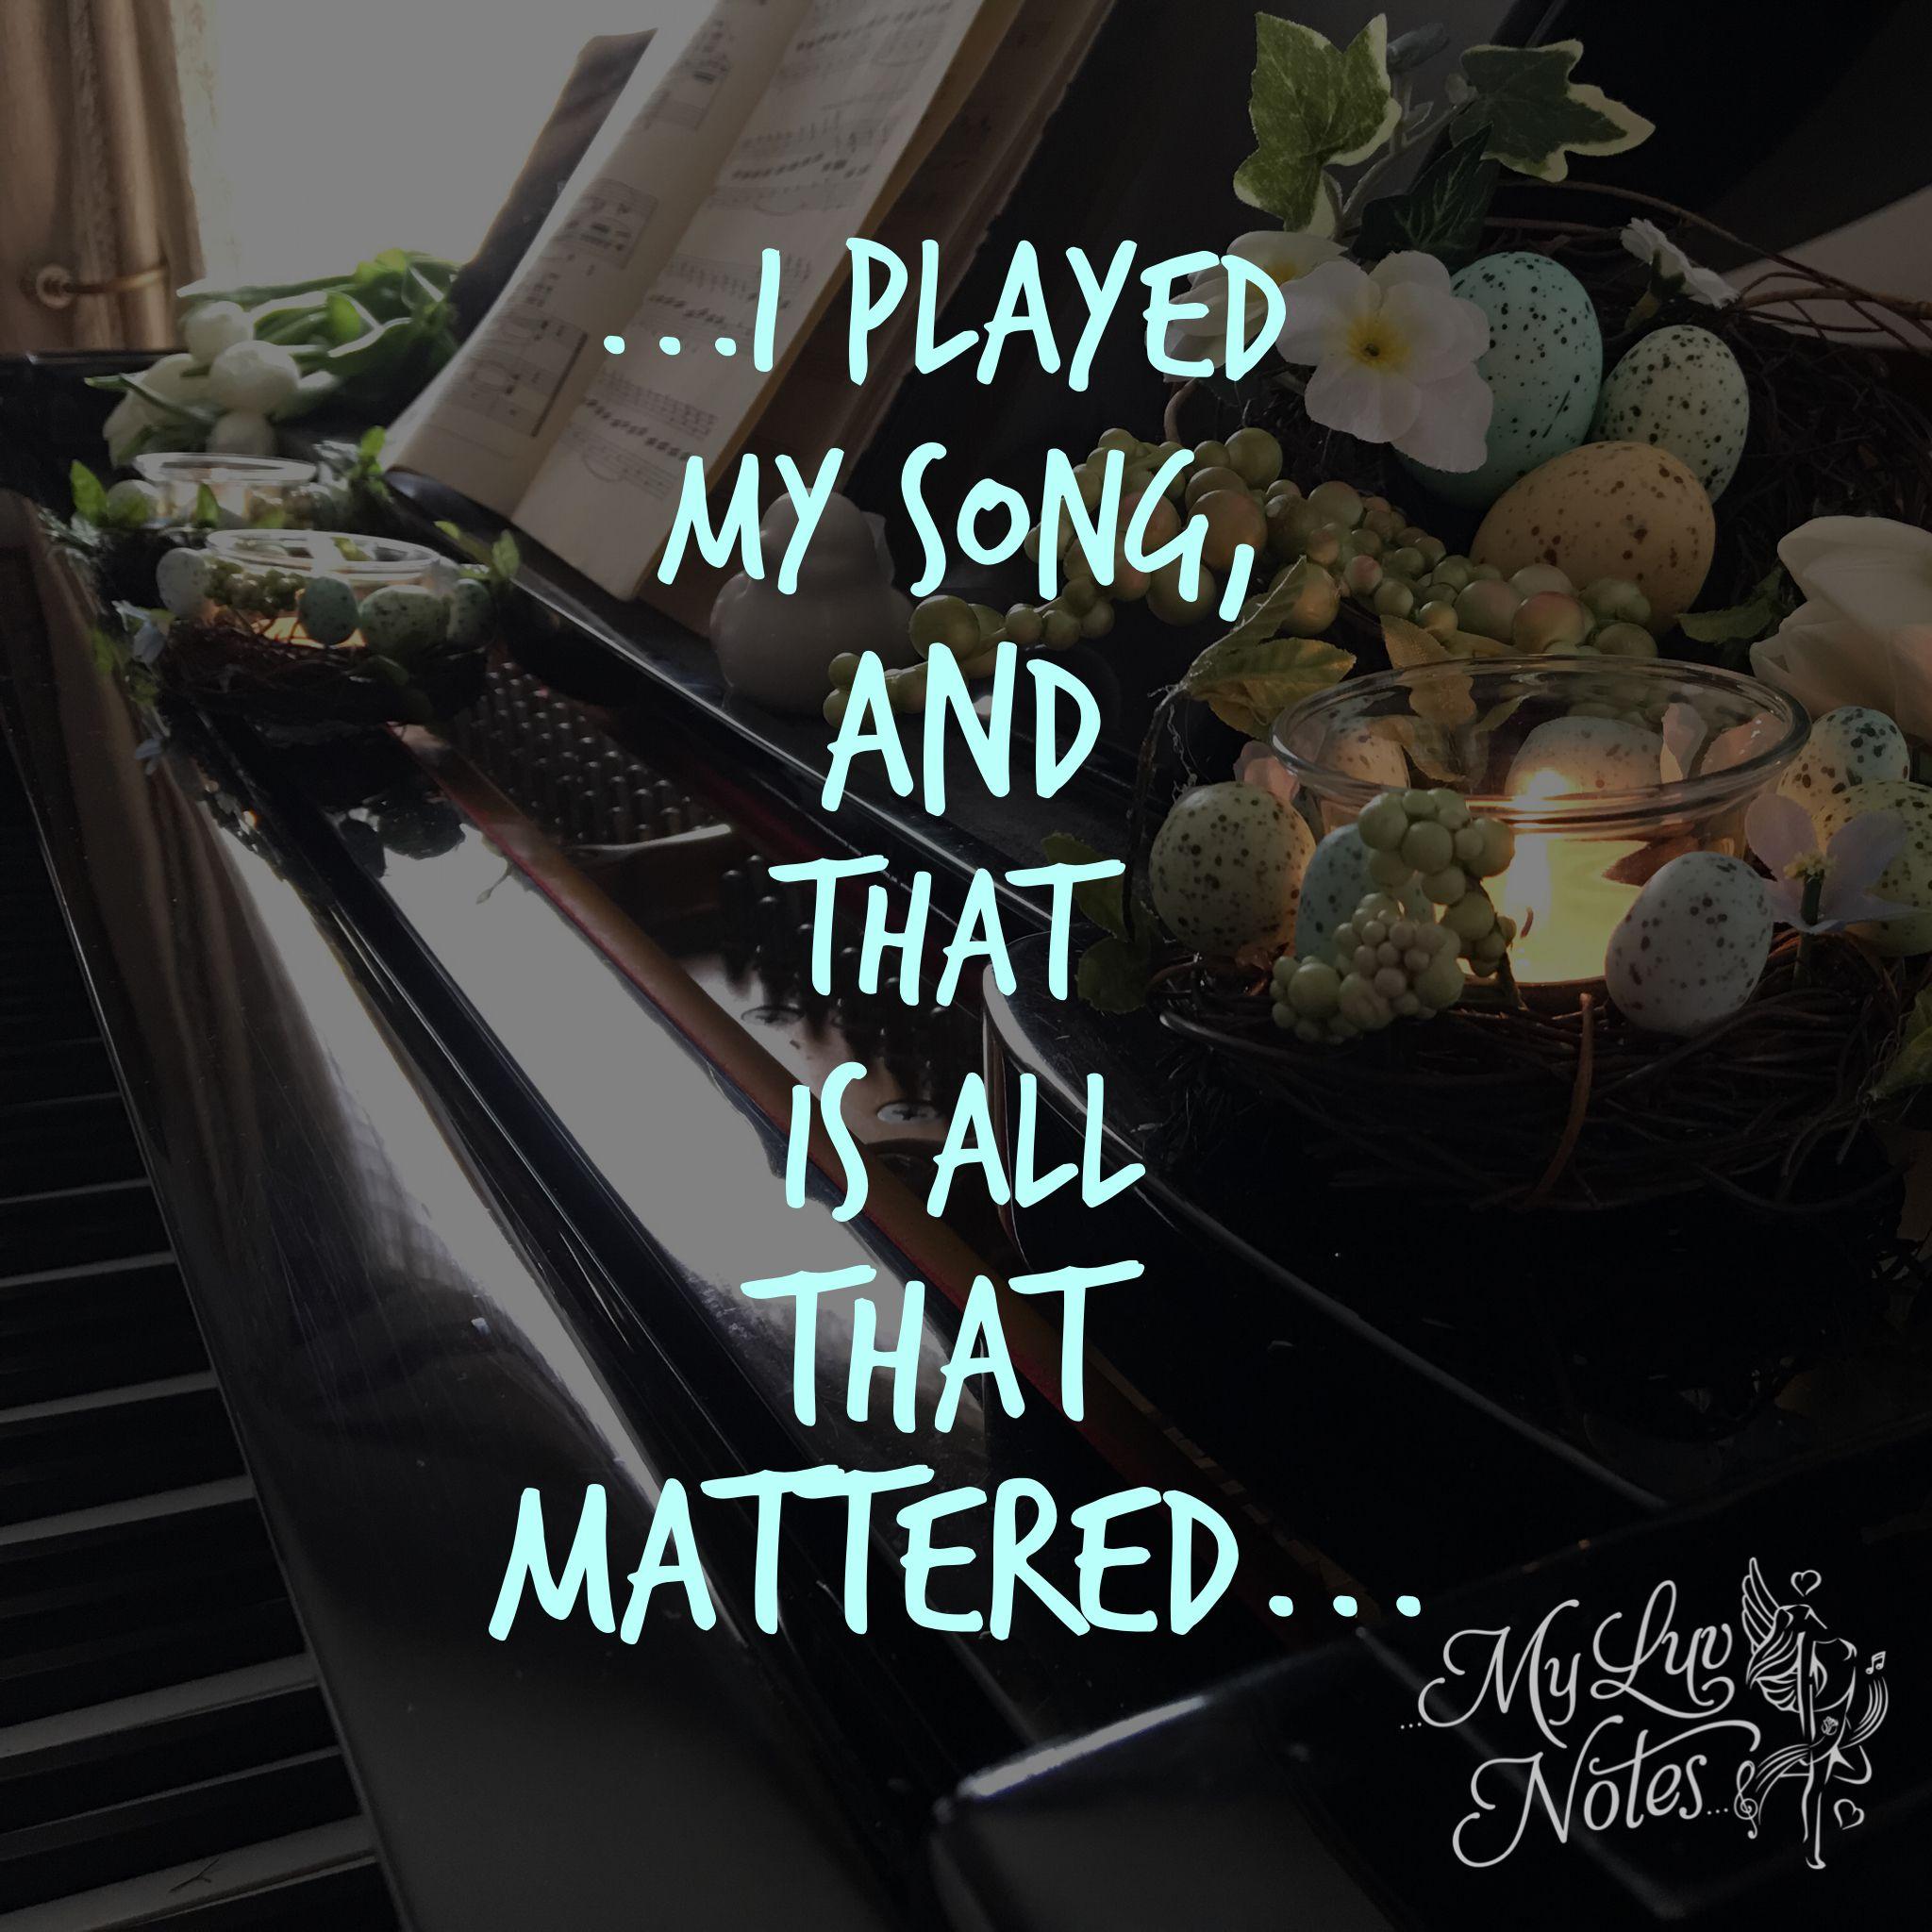 #myluvnotes #mln #luv #love #realtalk #realtalkquote #god #angel #angels #pray #life #lifestyle #believe #godquote #peace #lovequote #quoteoftheday #art #fitness #photo #photooftheday #pianocover #life #live #lifestyle #instamood #inspiration #inspiration #motivation #truth #writer